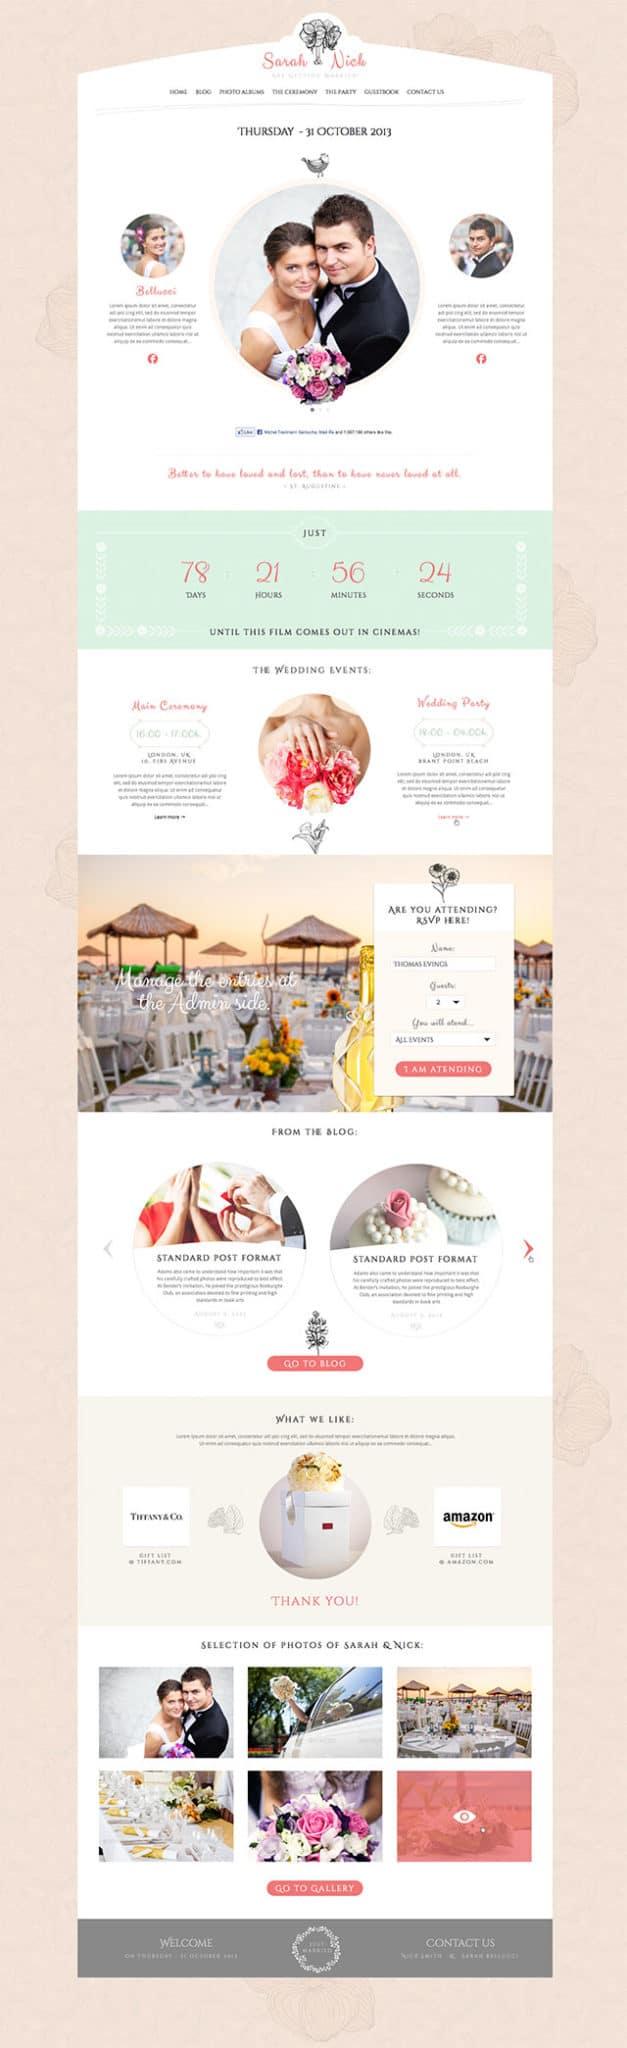 the-wedding-day